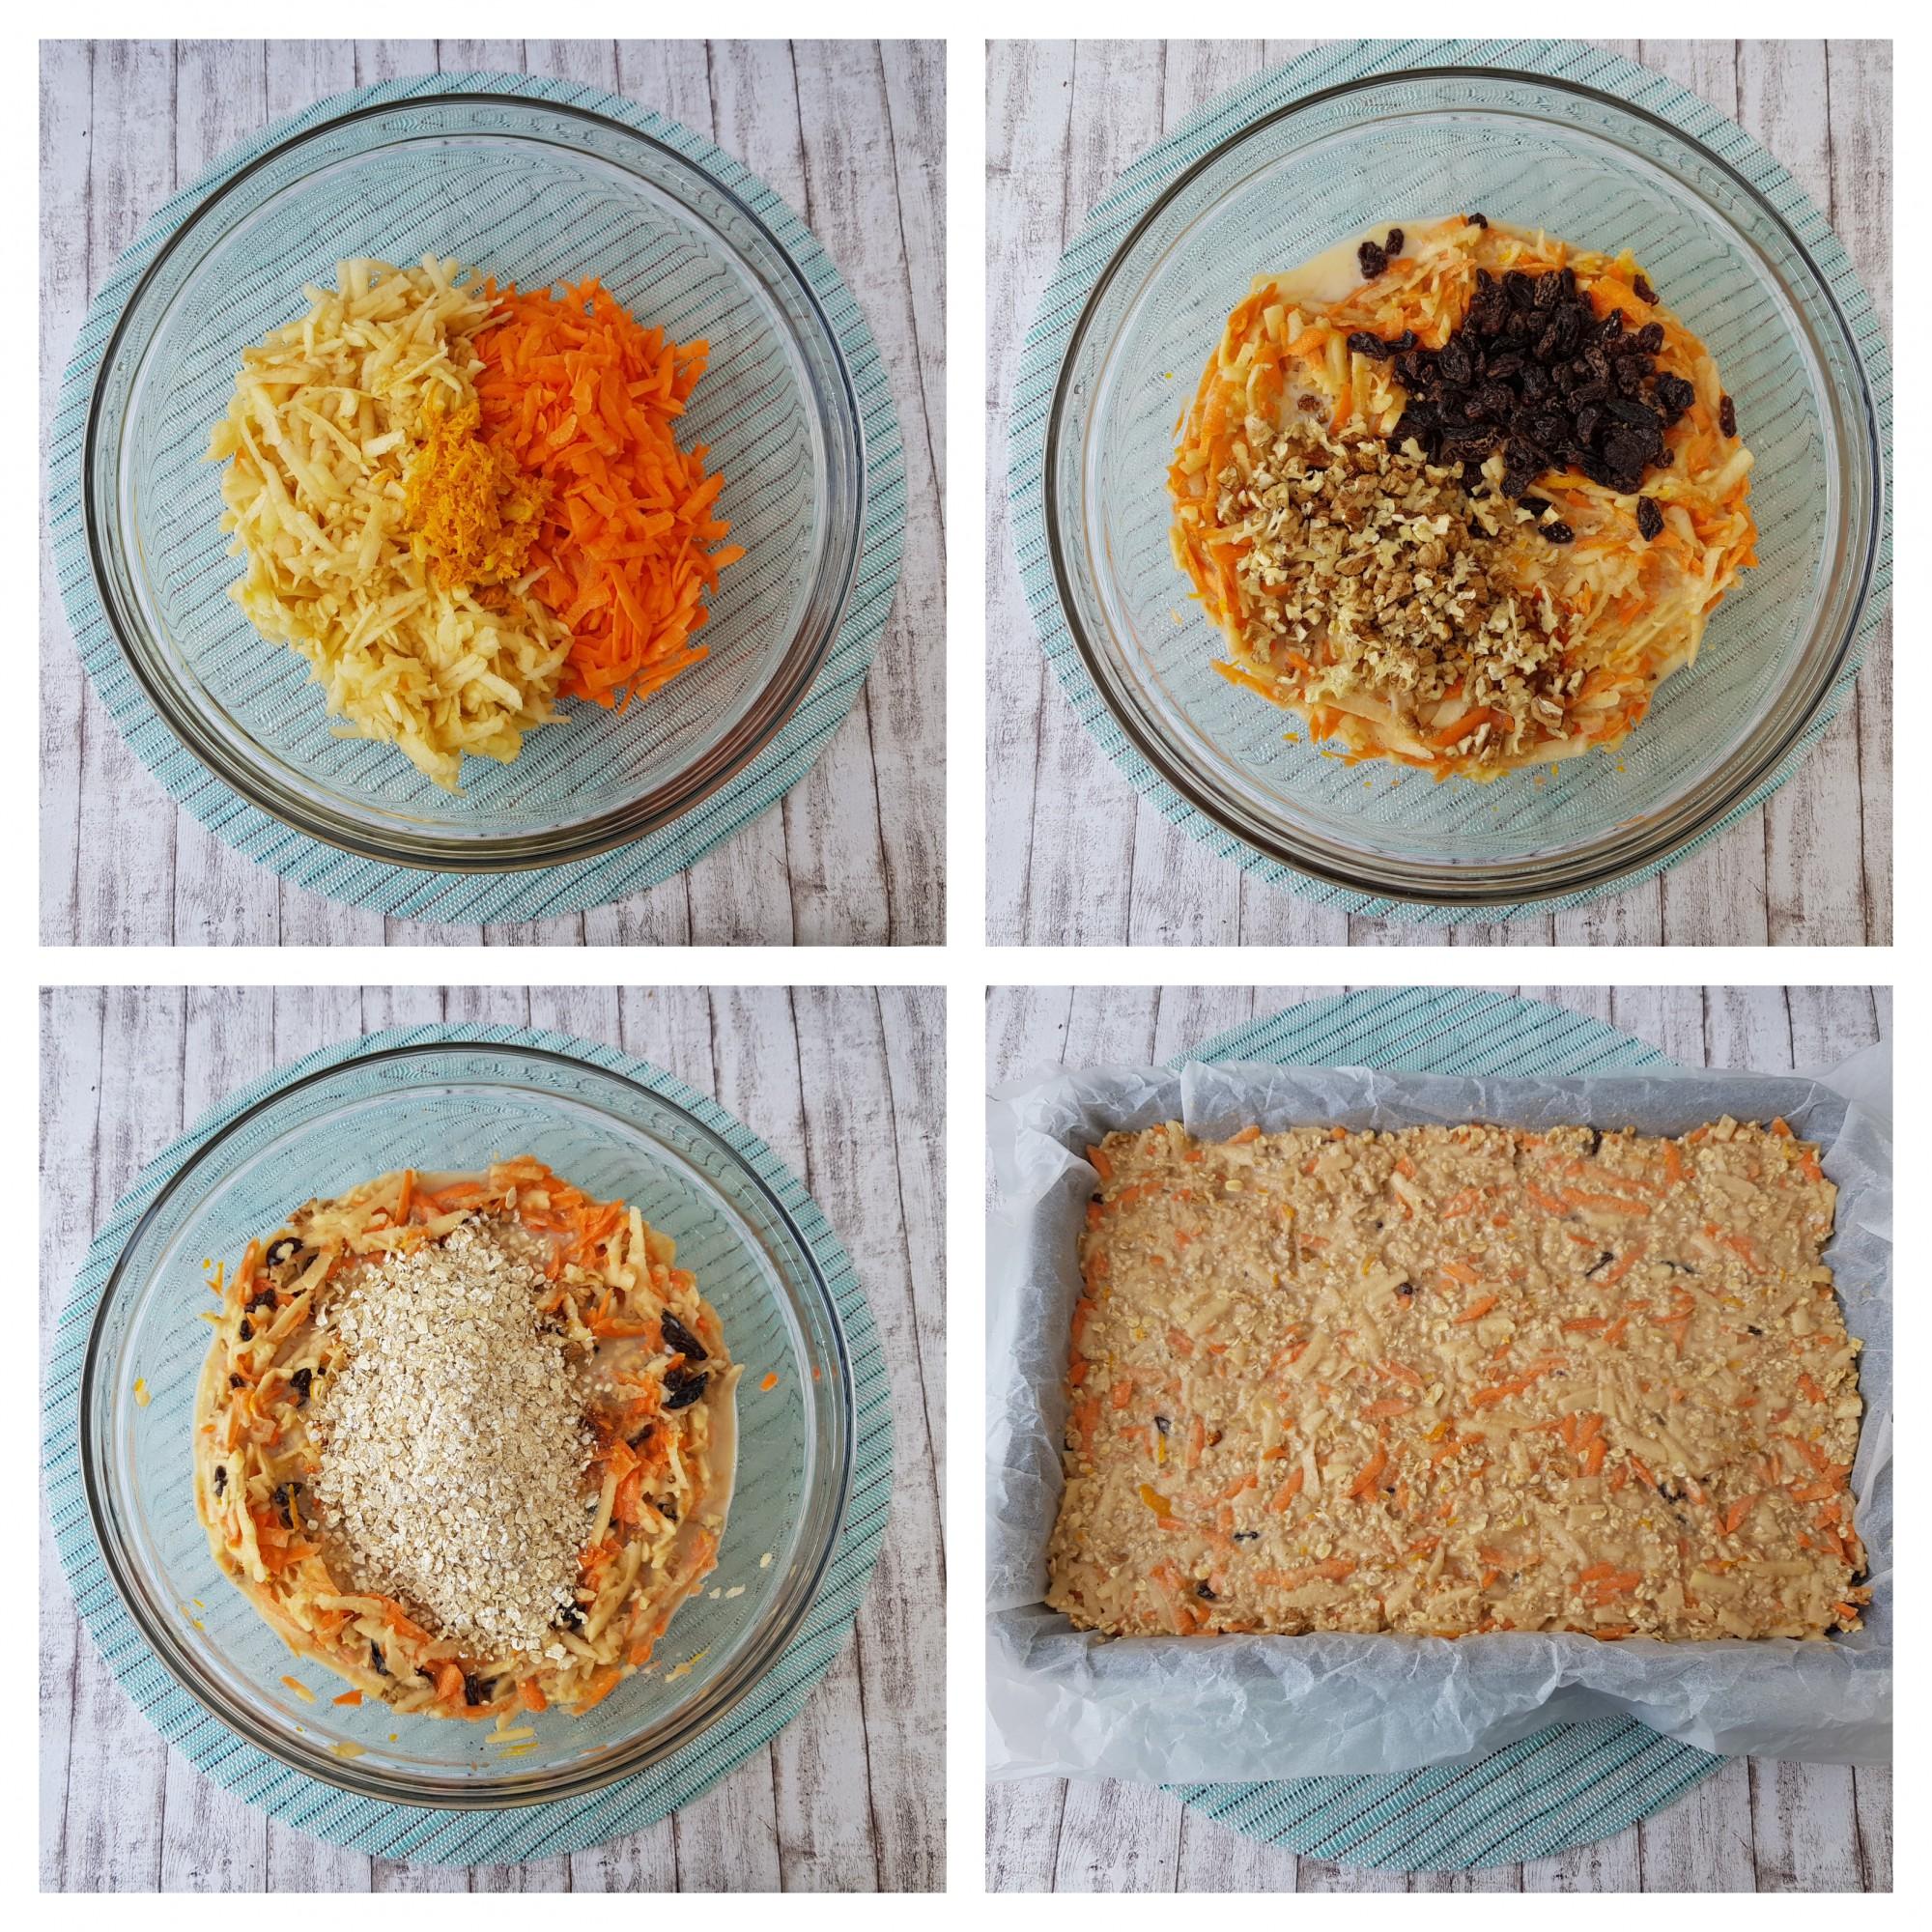 prajitura cu morcovi si fulgi de ovaz - foodieopedia